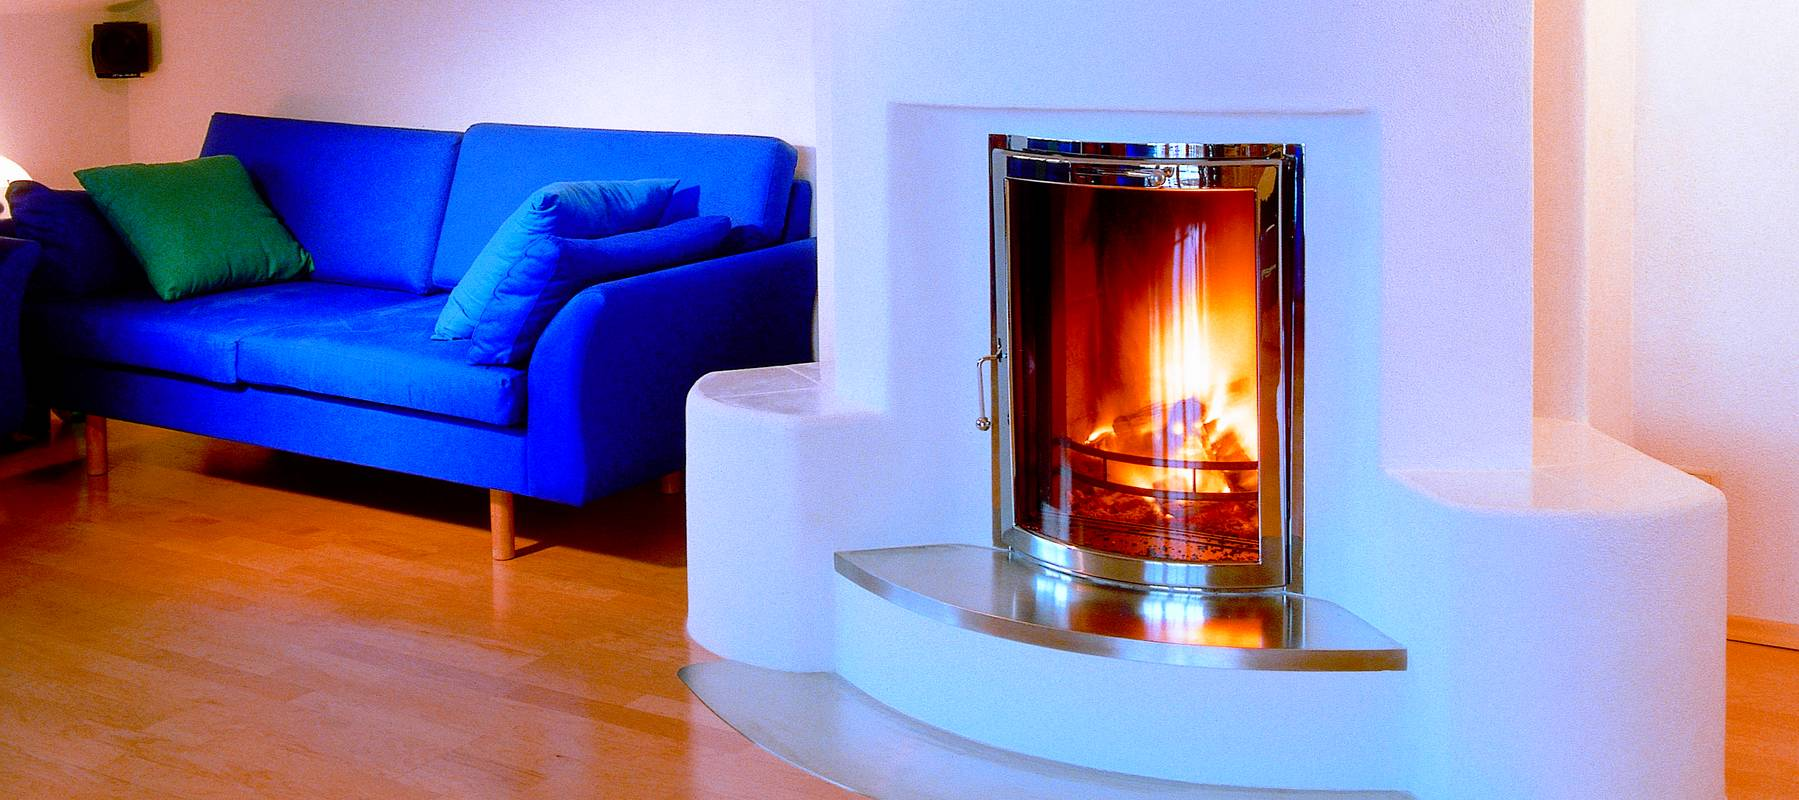 biofire hessen kachel fen kamine und kamin fen. Black Bedroom Furniture Sets. Home Design Ideas